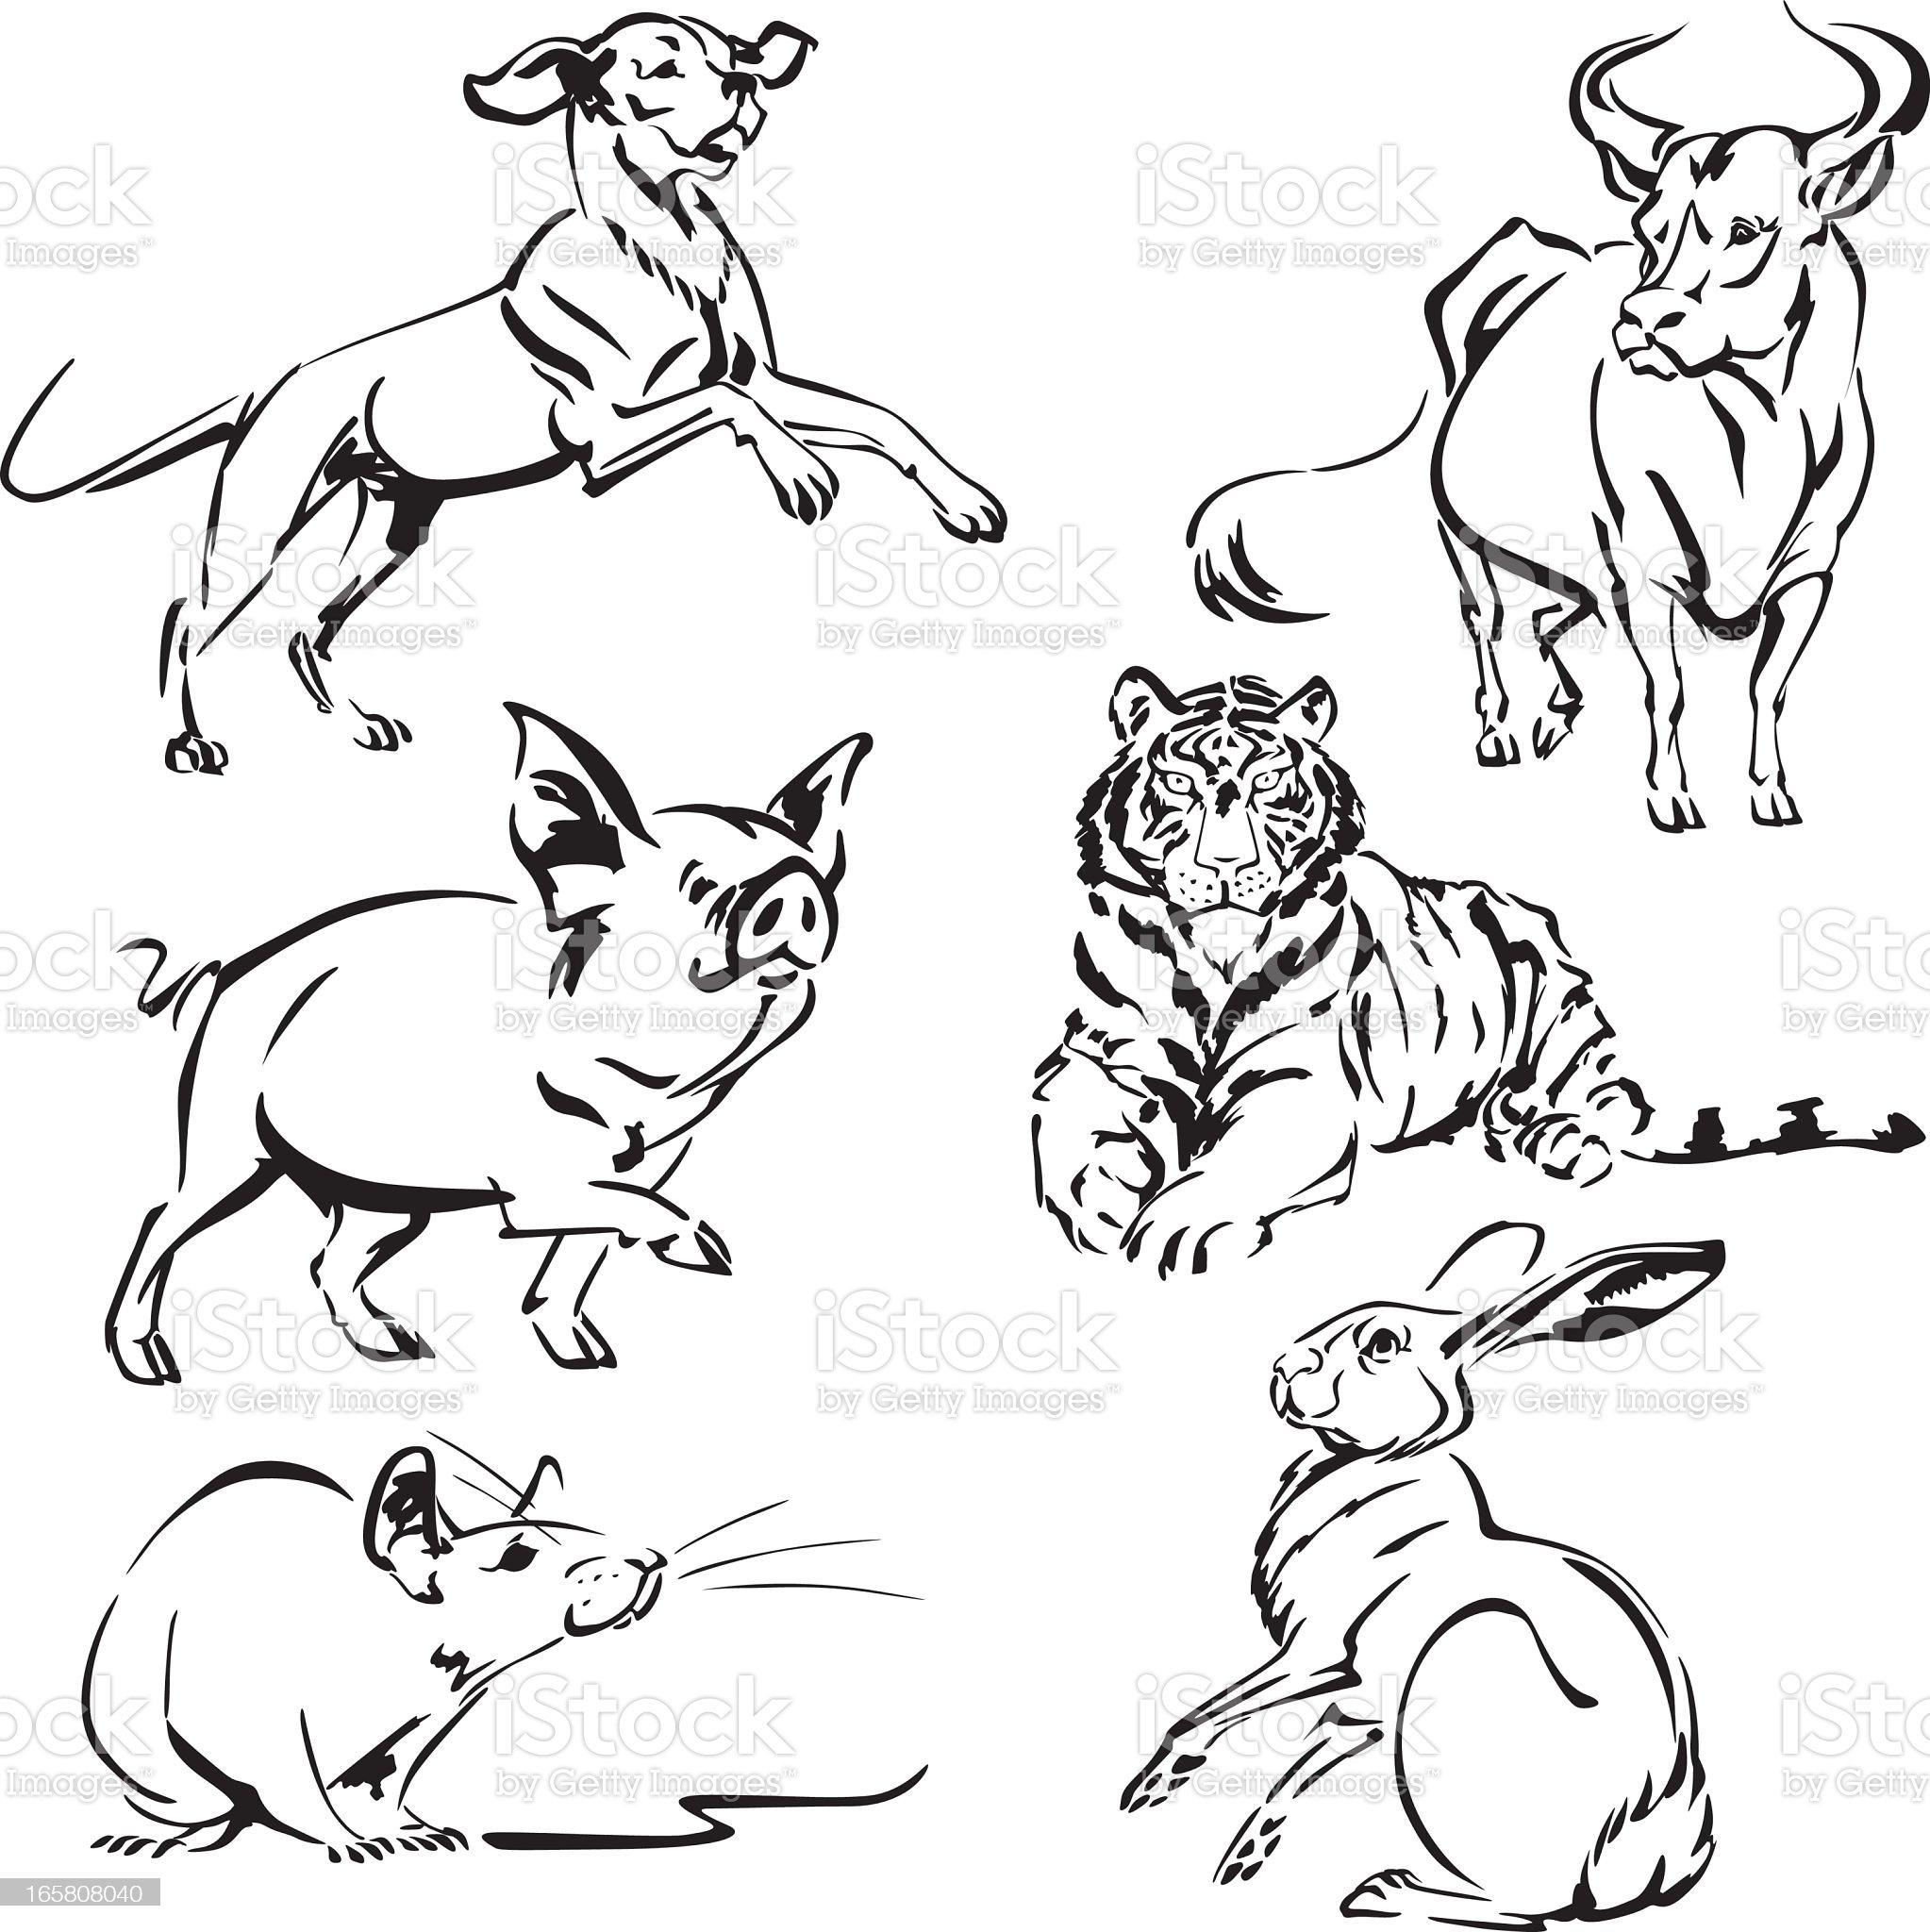 Animals of asian zodiac2 royalty-free stock vector art